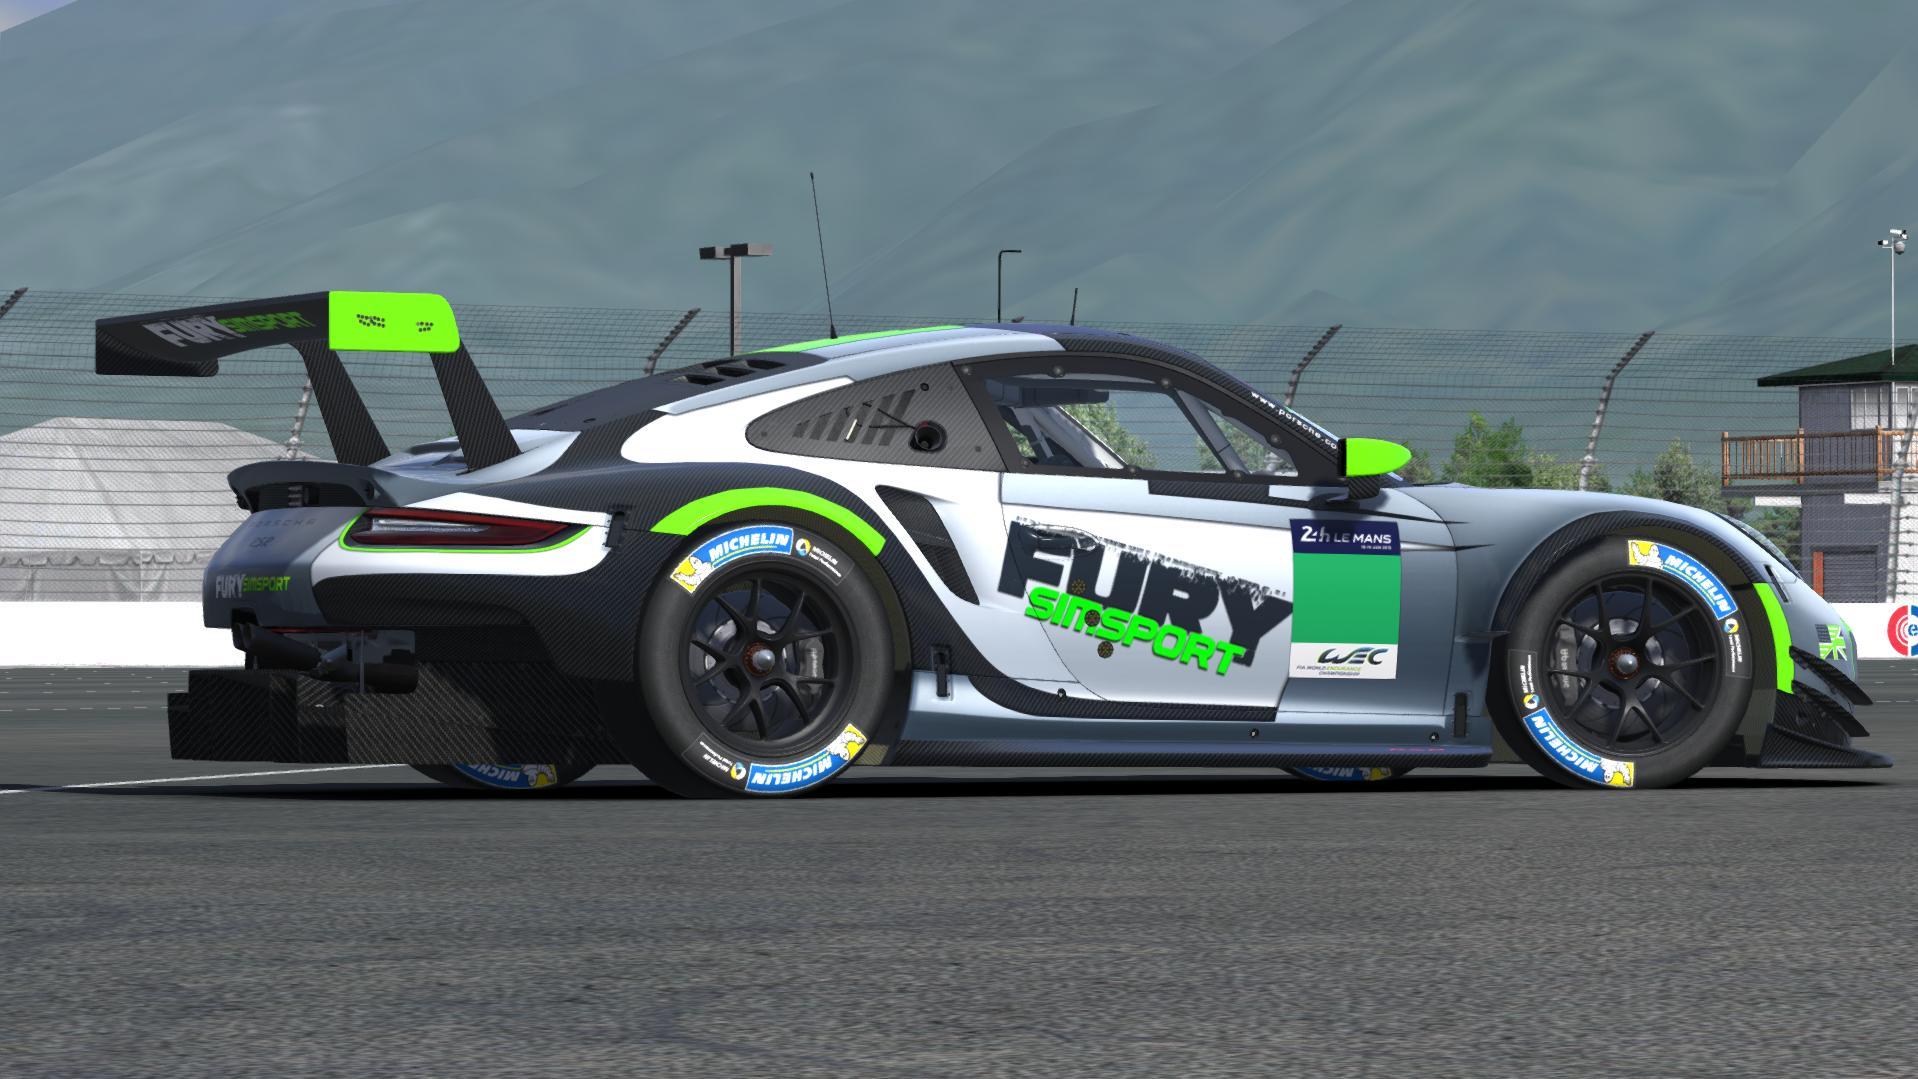 Preview of FURY Simsport Porsche 911 RSR (test) by Justin S Davis